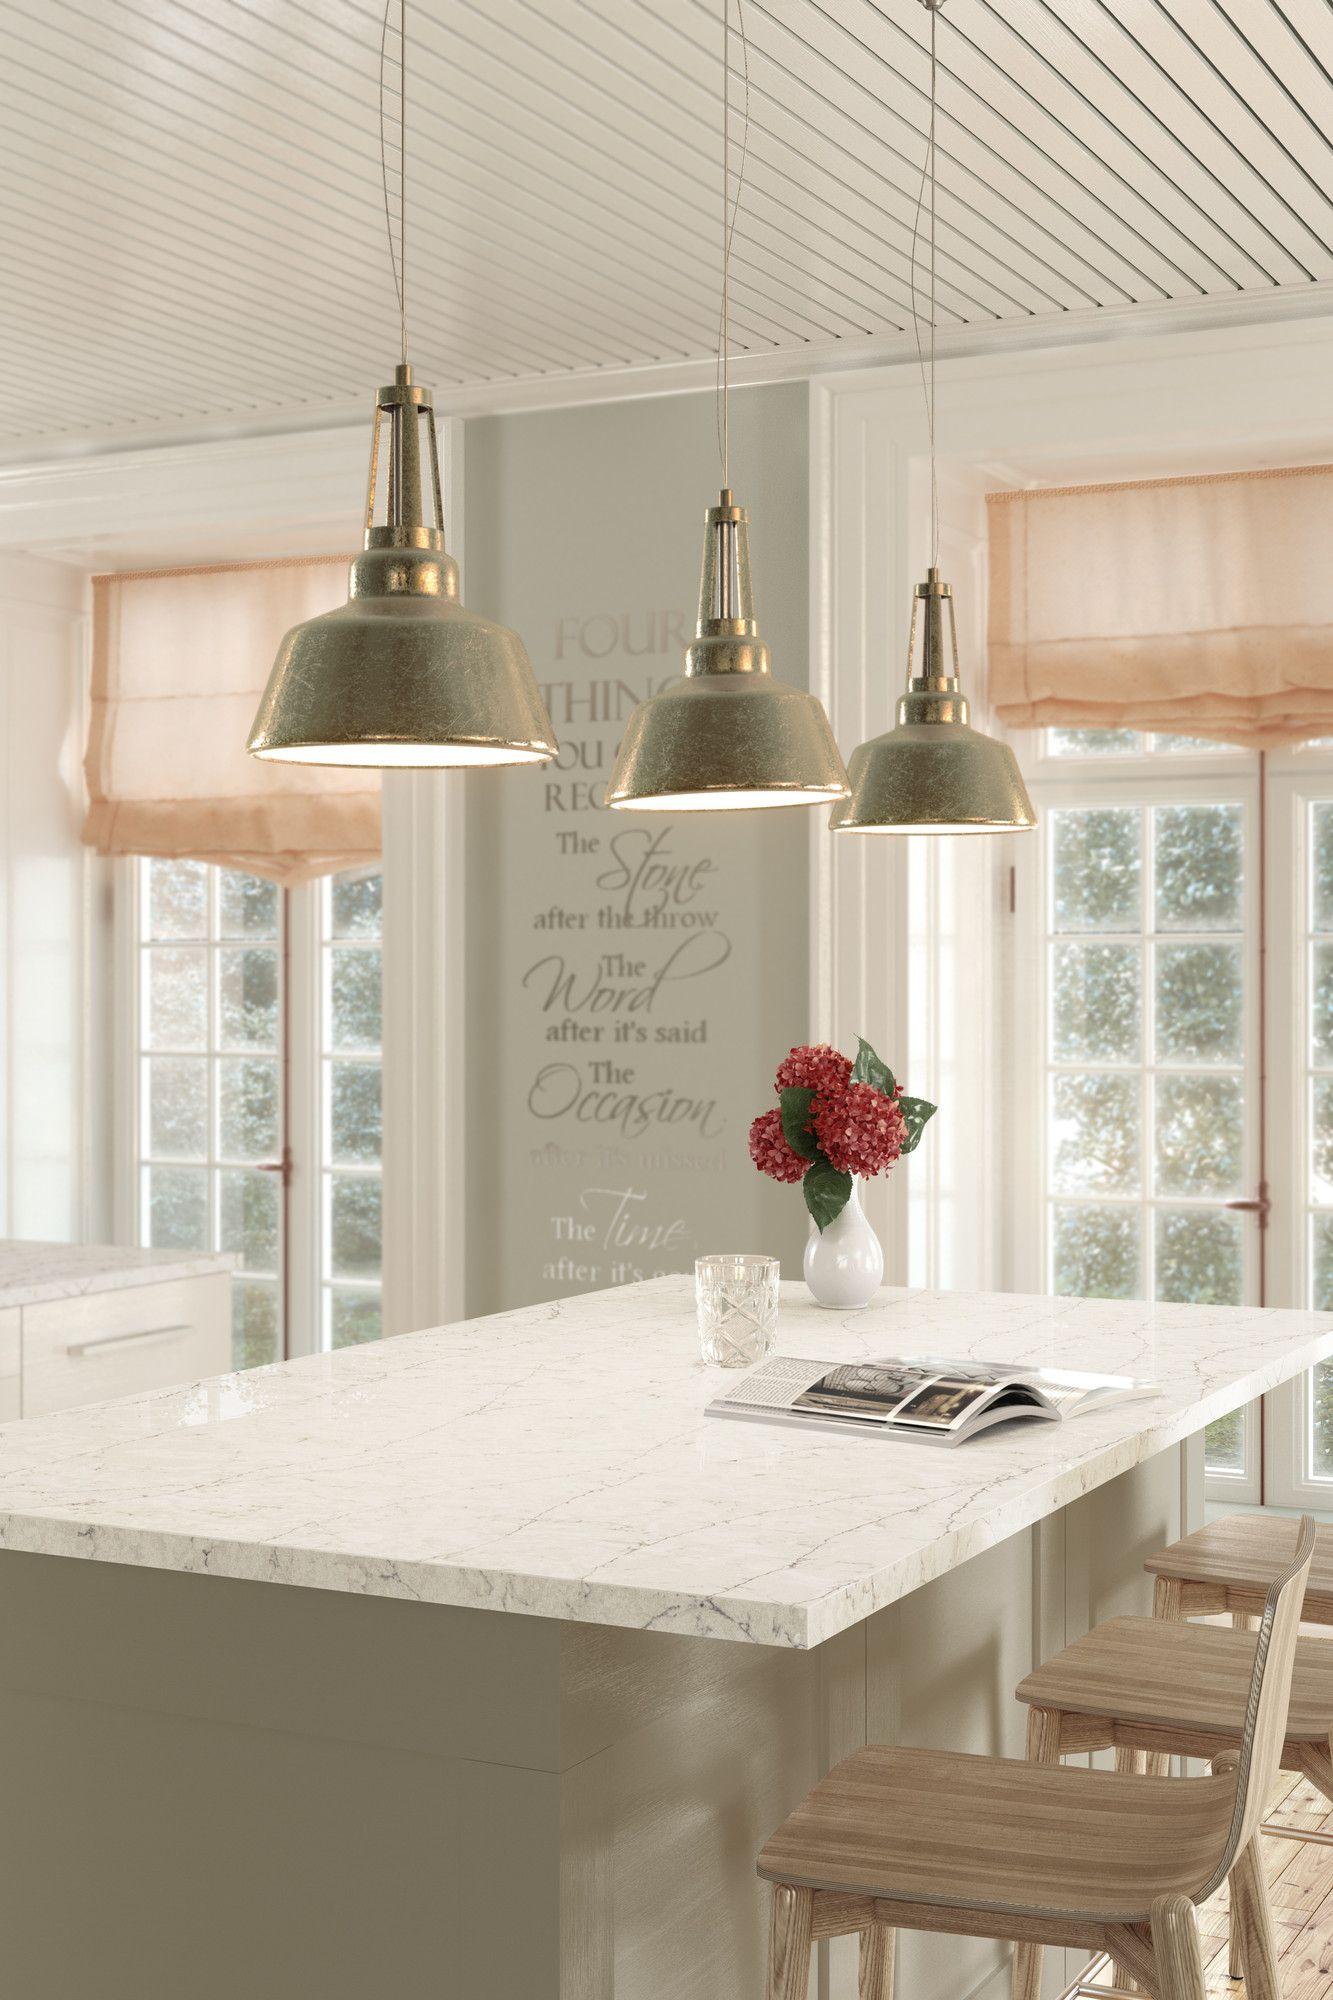 tile ideas willett valdani win kitchen backsplash samples countertops quartz countertop metal zodiaq